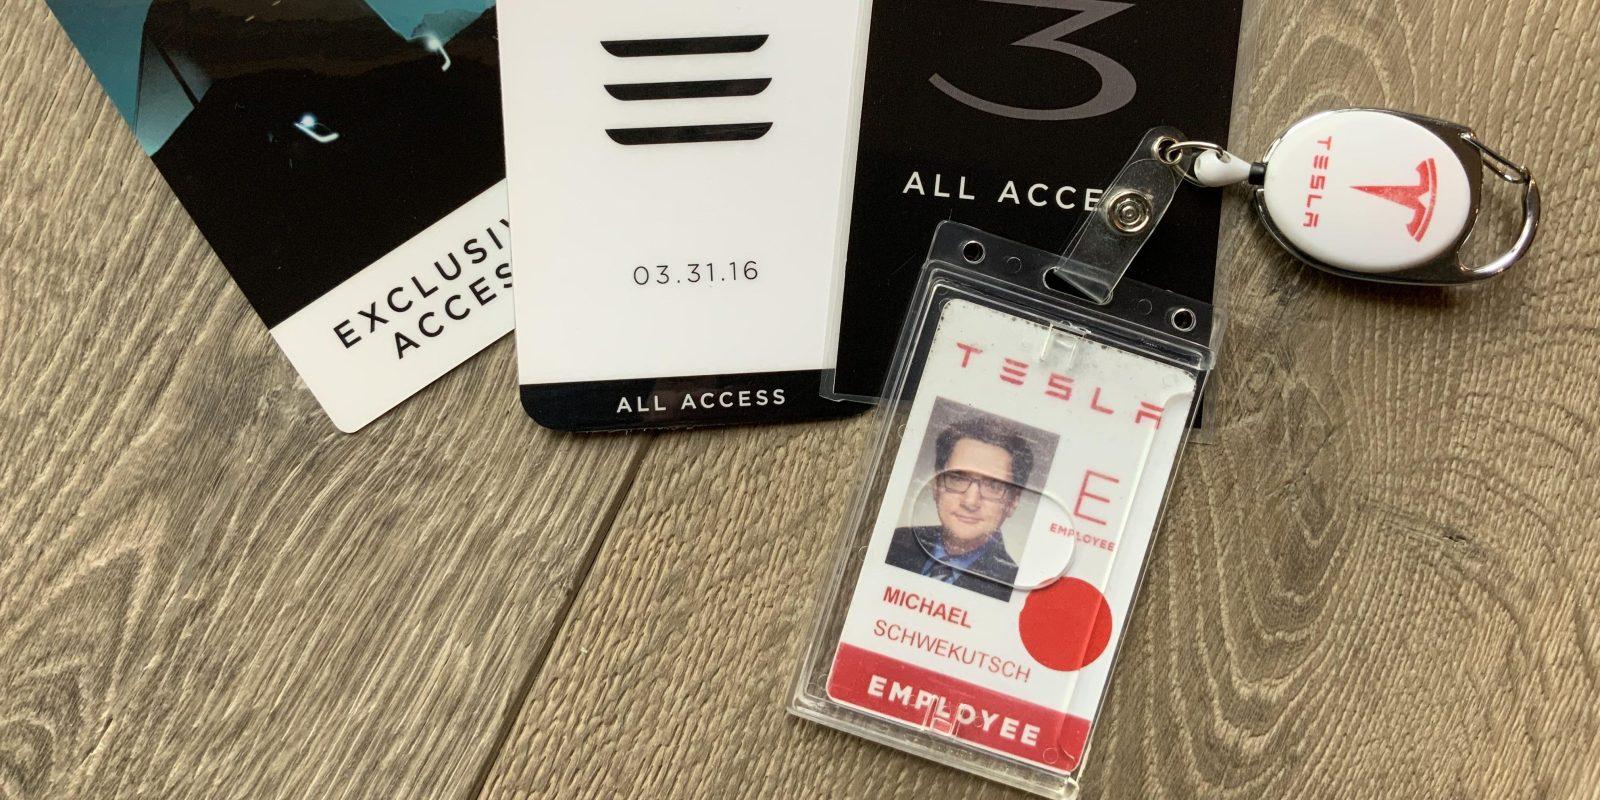 Michael Schwekutsch, ex-engenheiro da Tesla contratado pela Apple